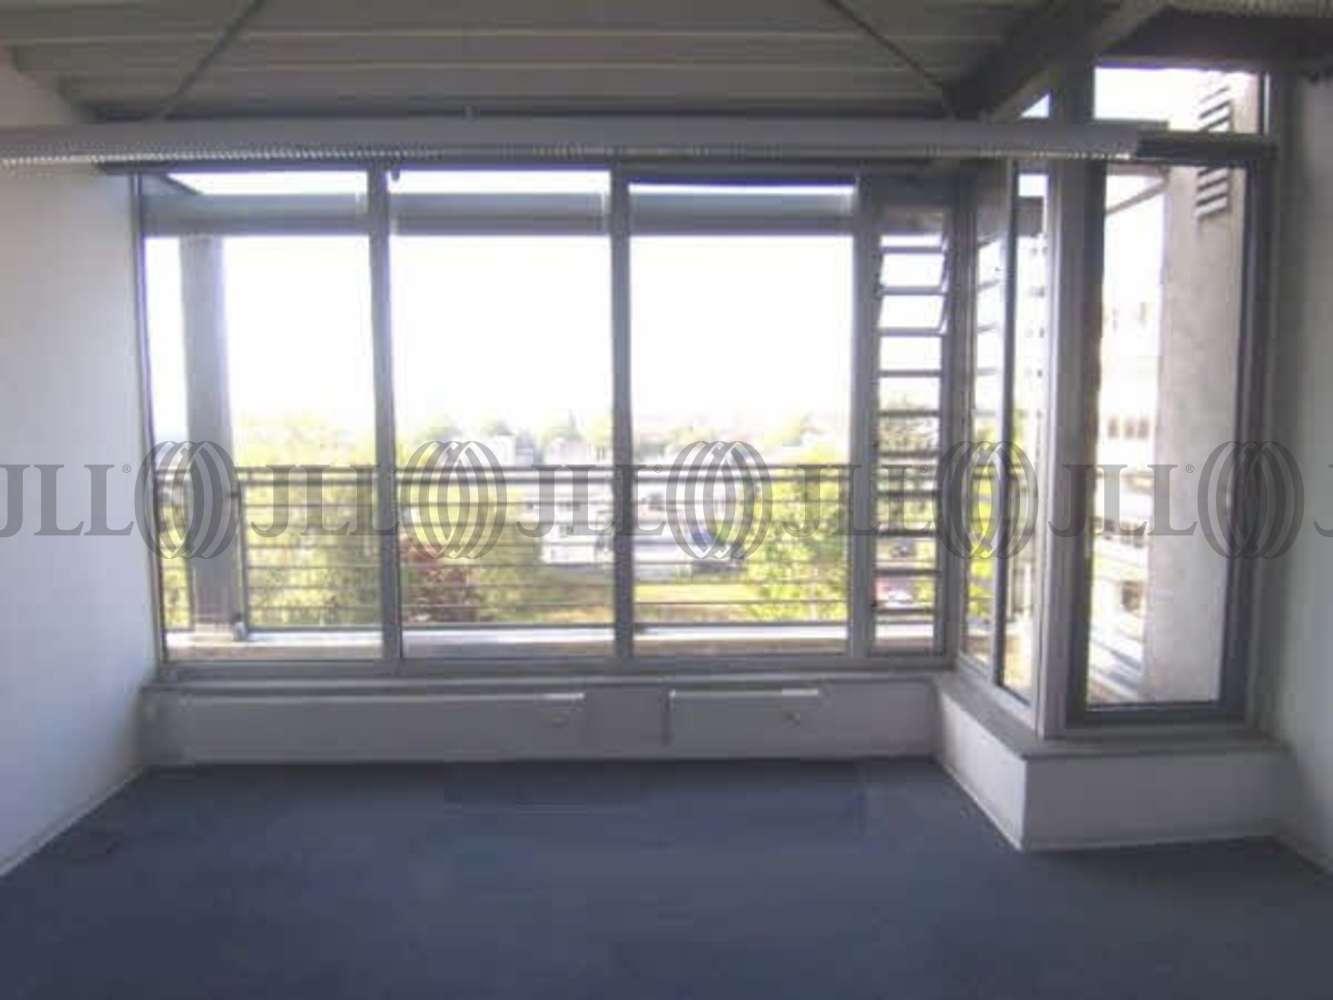 Büros Frankfurt am main, 60388 - Büro - Frankfurt am Main, Bergen-Enkheim - F2175 - 9837540